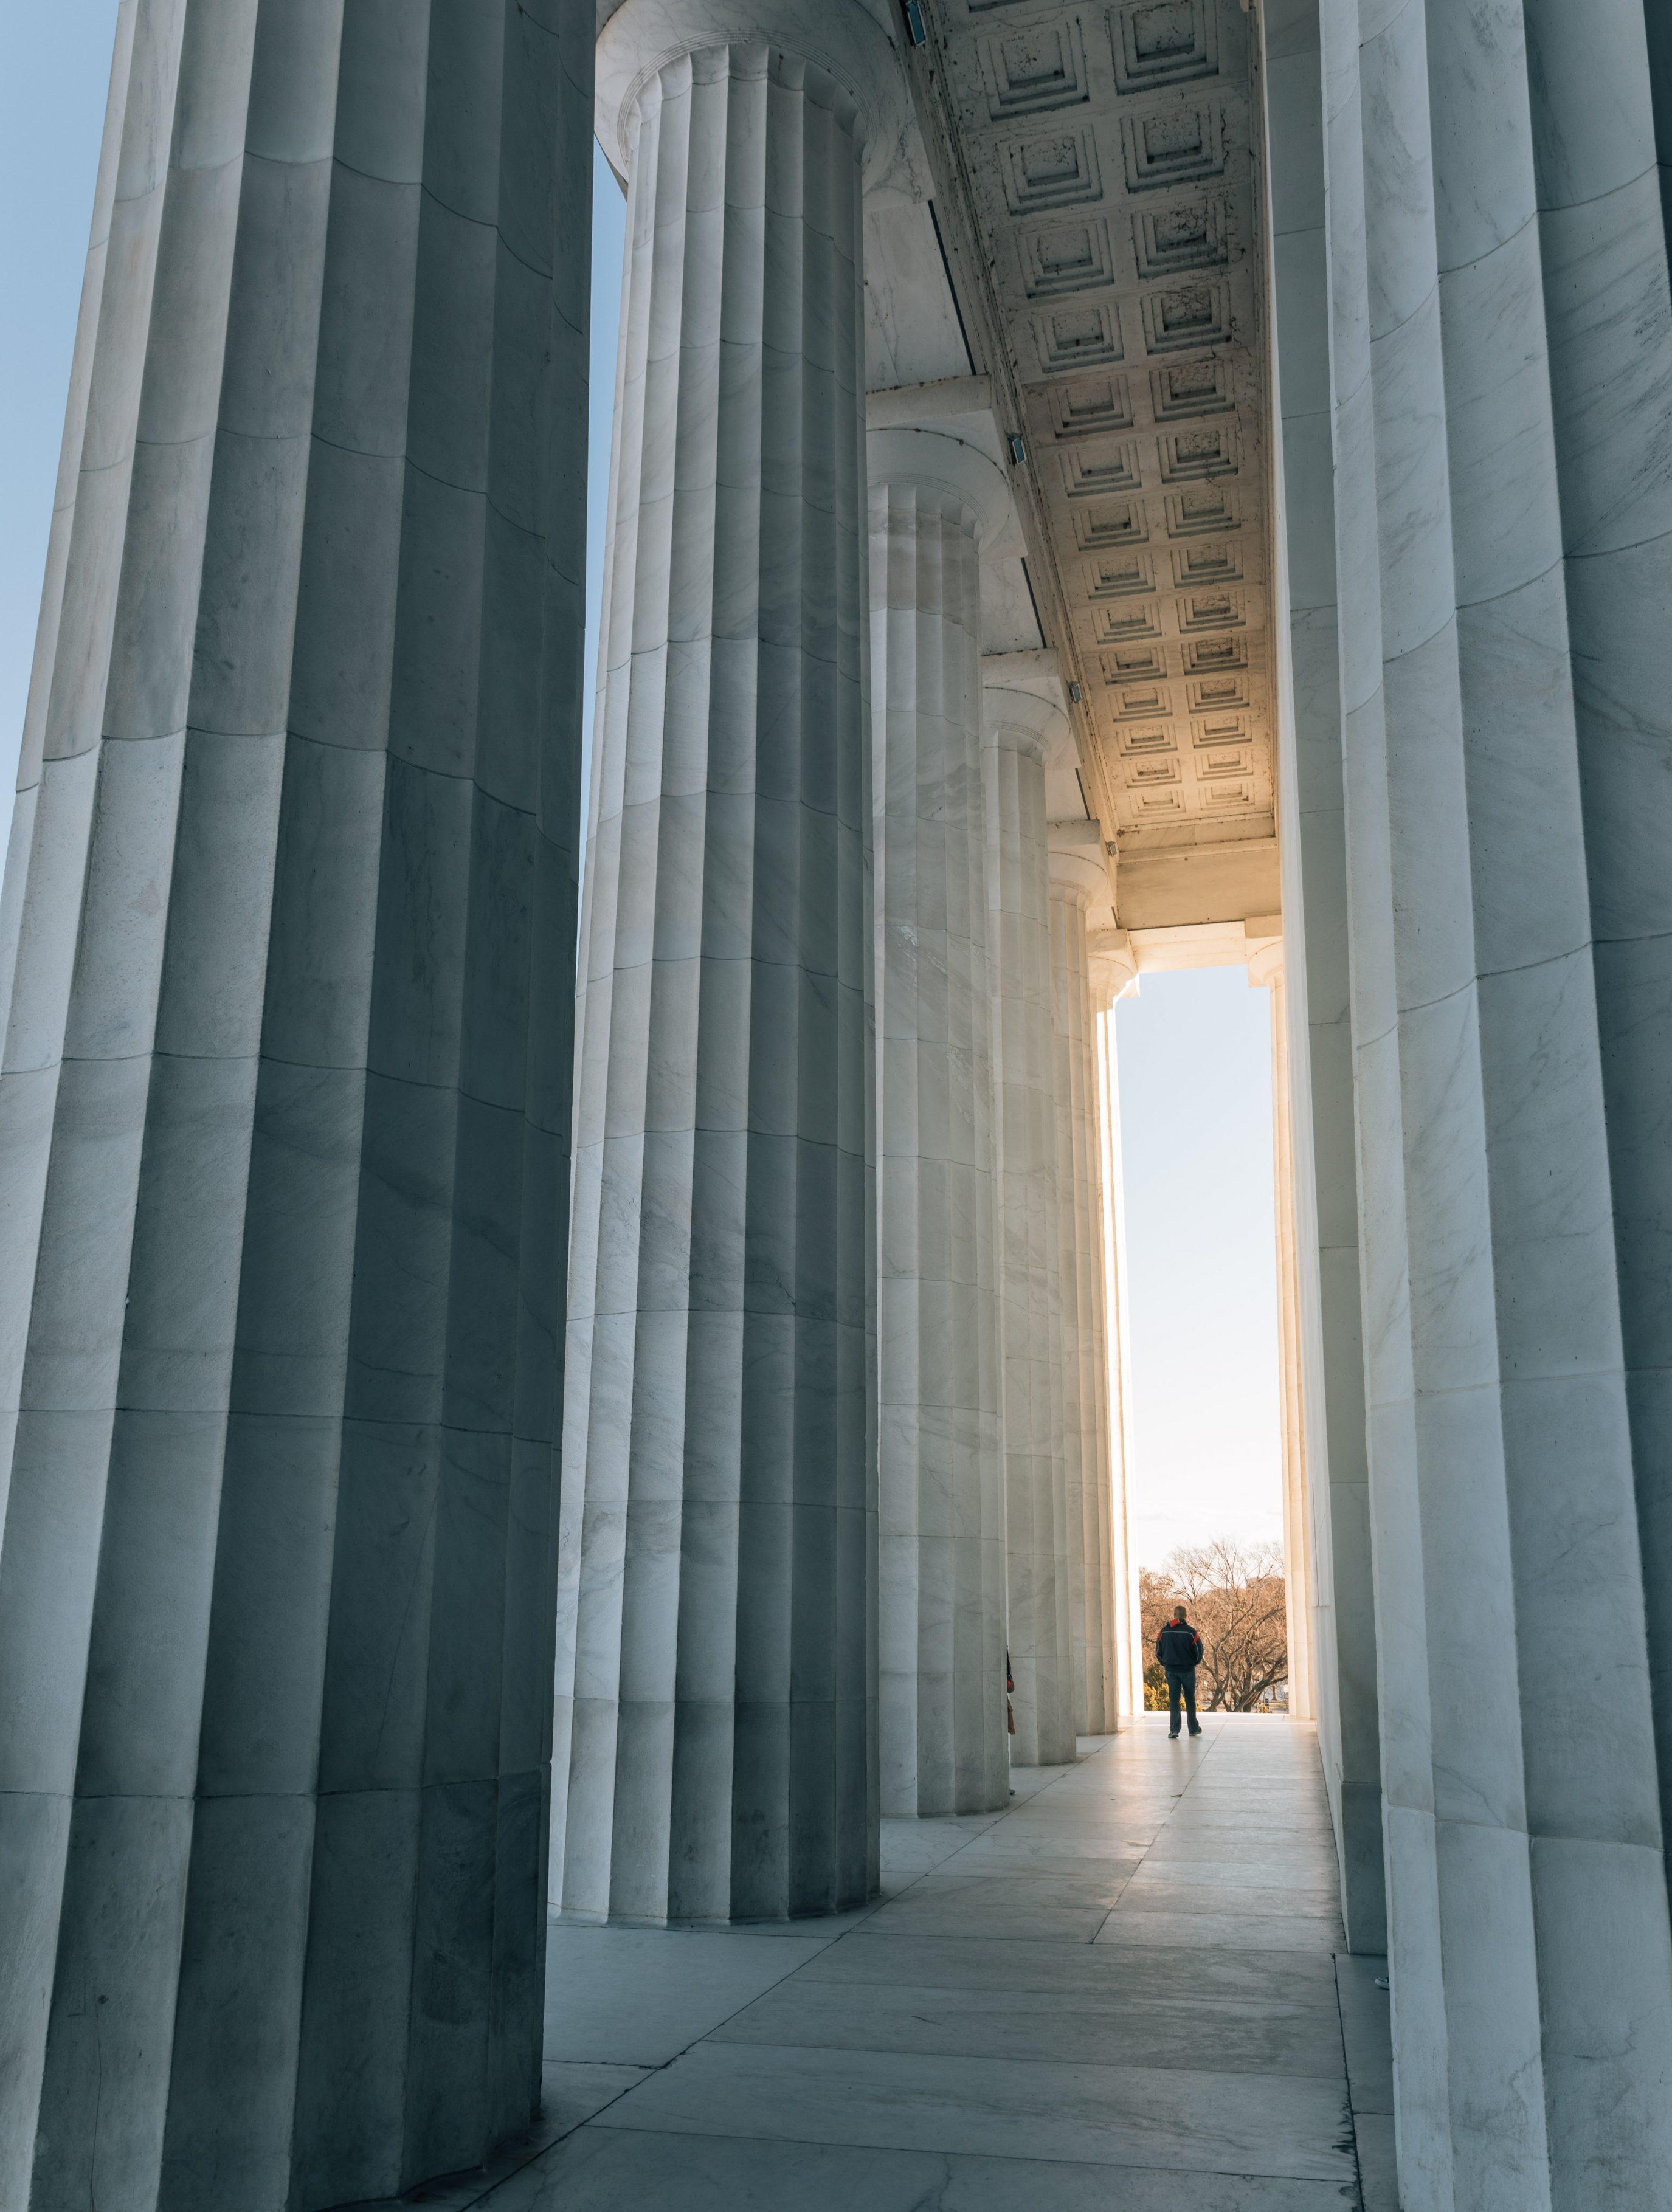 Lincoln Memorial Columns Day